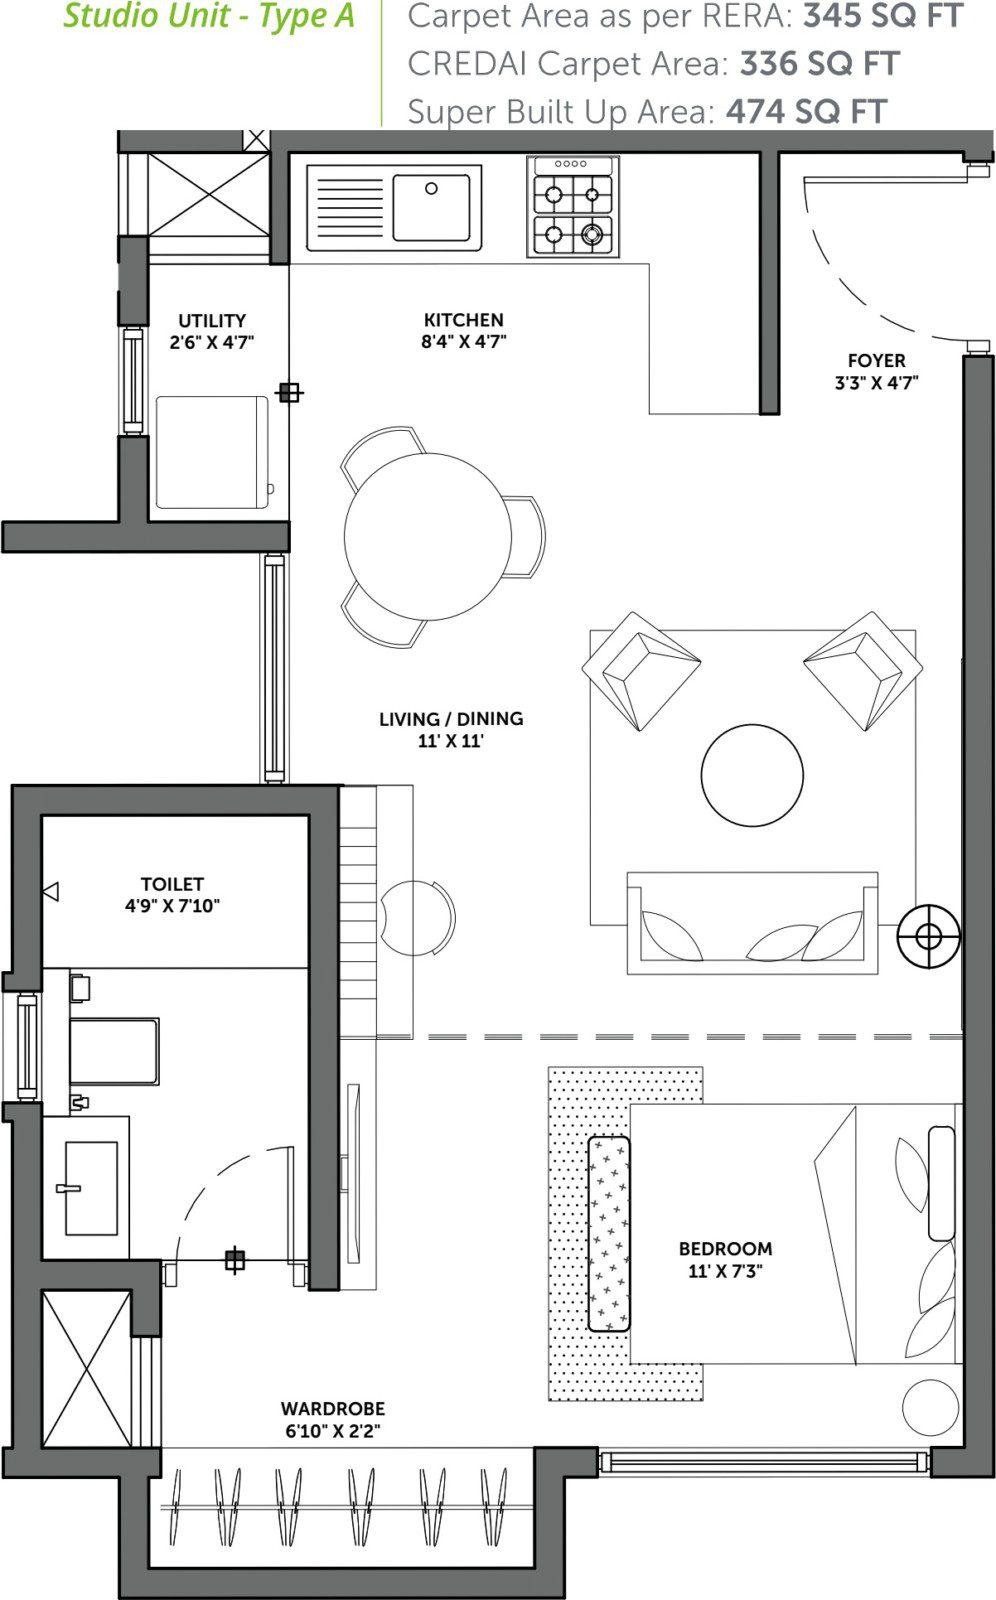 Assetz 63 Degree East - 1 BHK Floor Plan